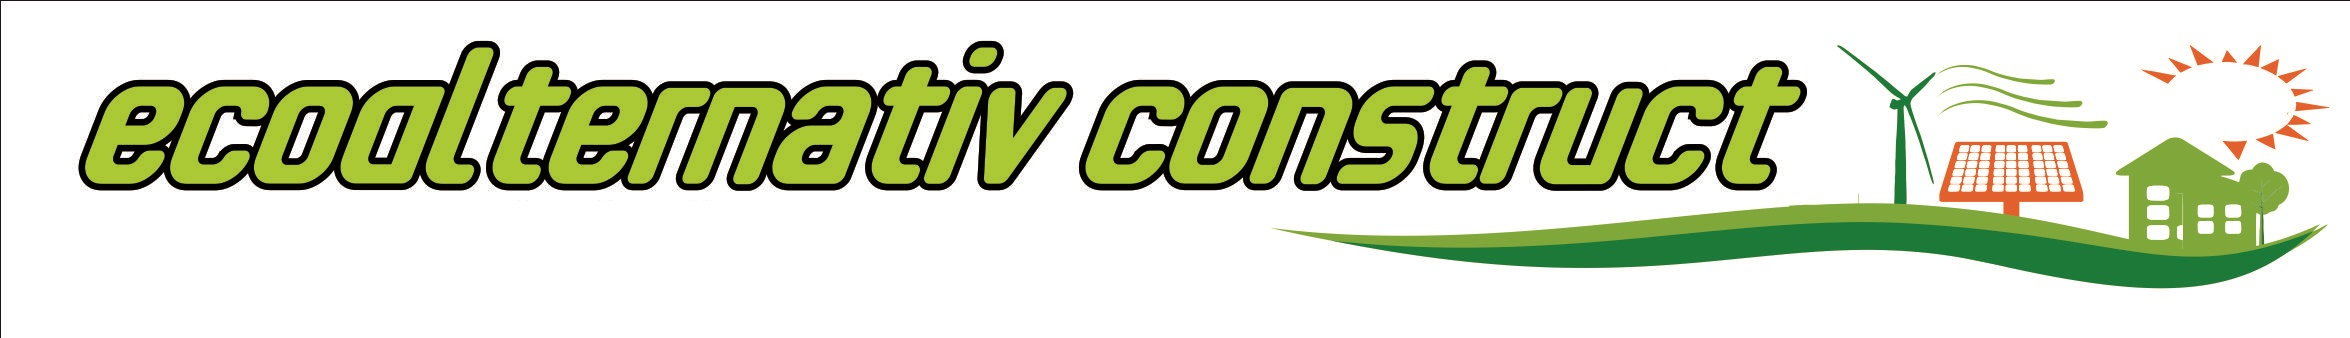 Banner - Copy